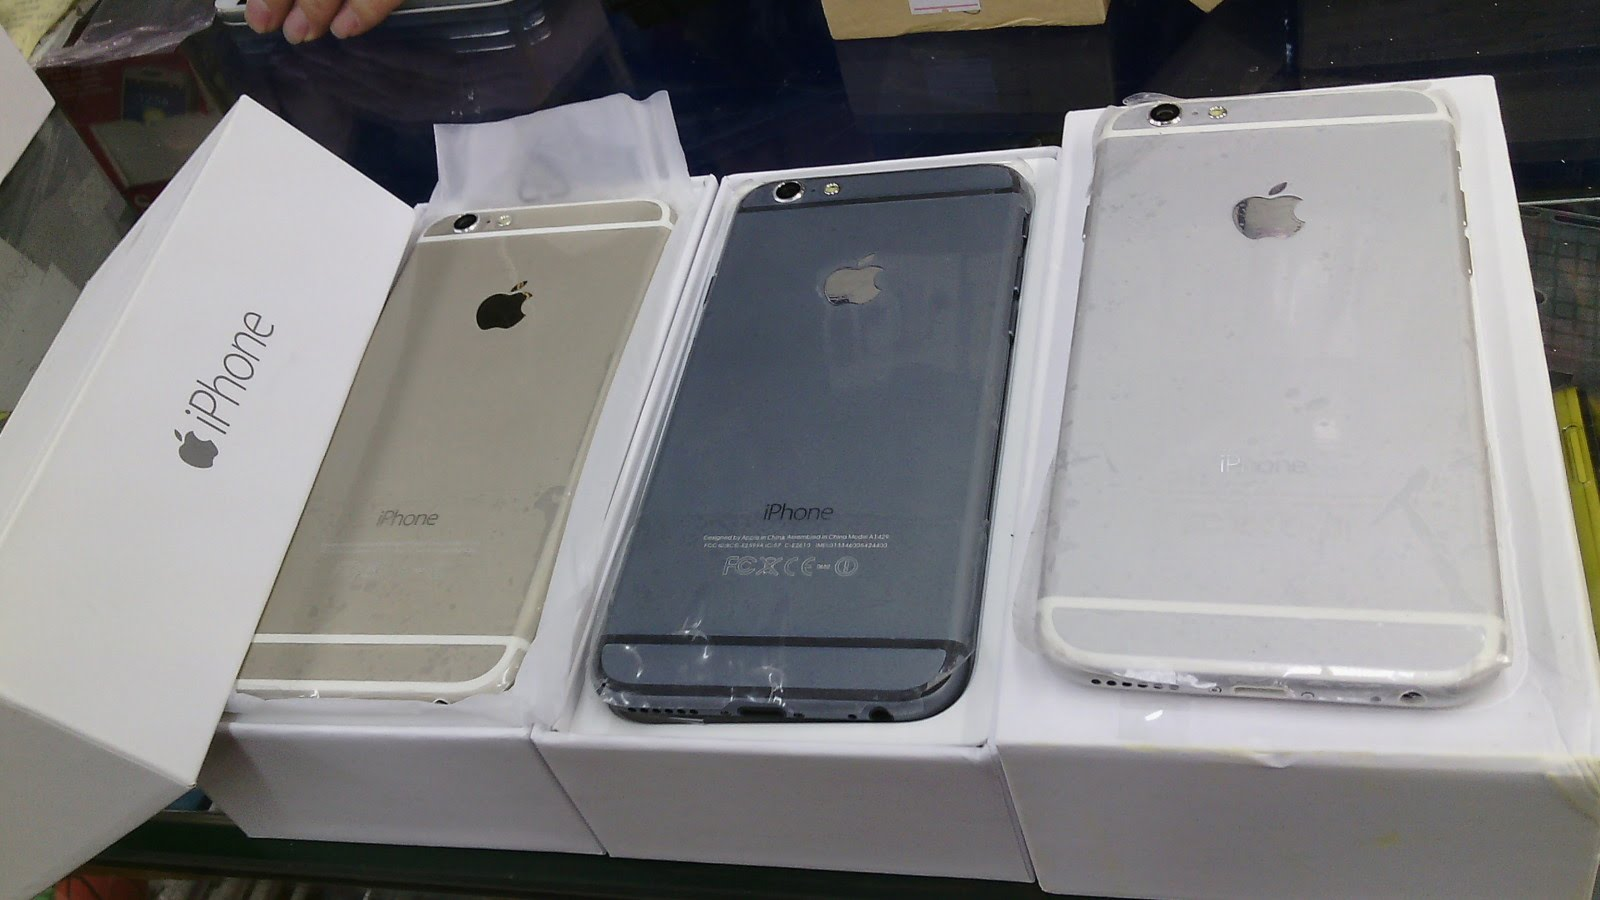 Spesifikasi iPhone 6 + HDC Supercopy cfbdef5f3e